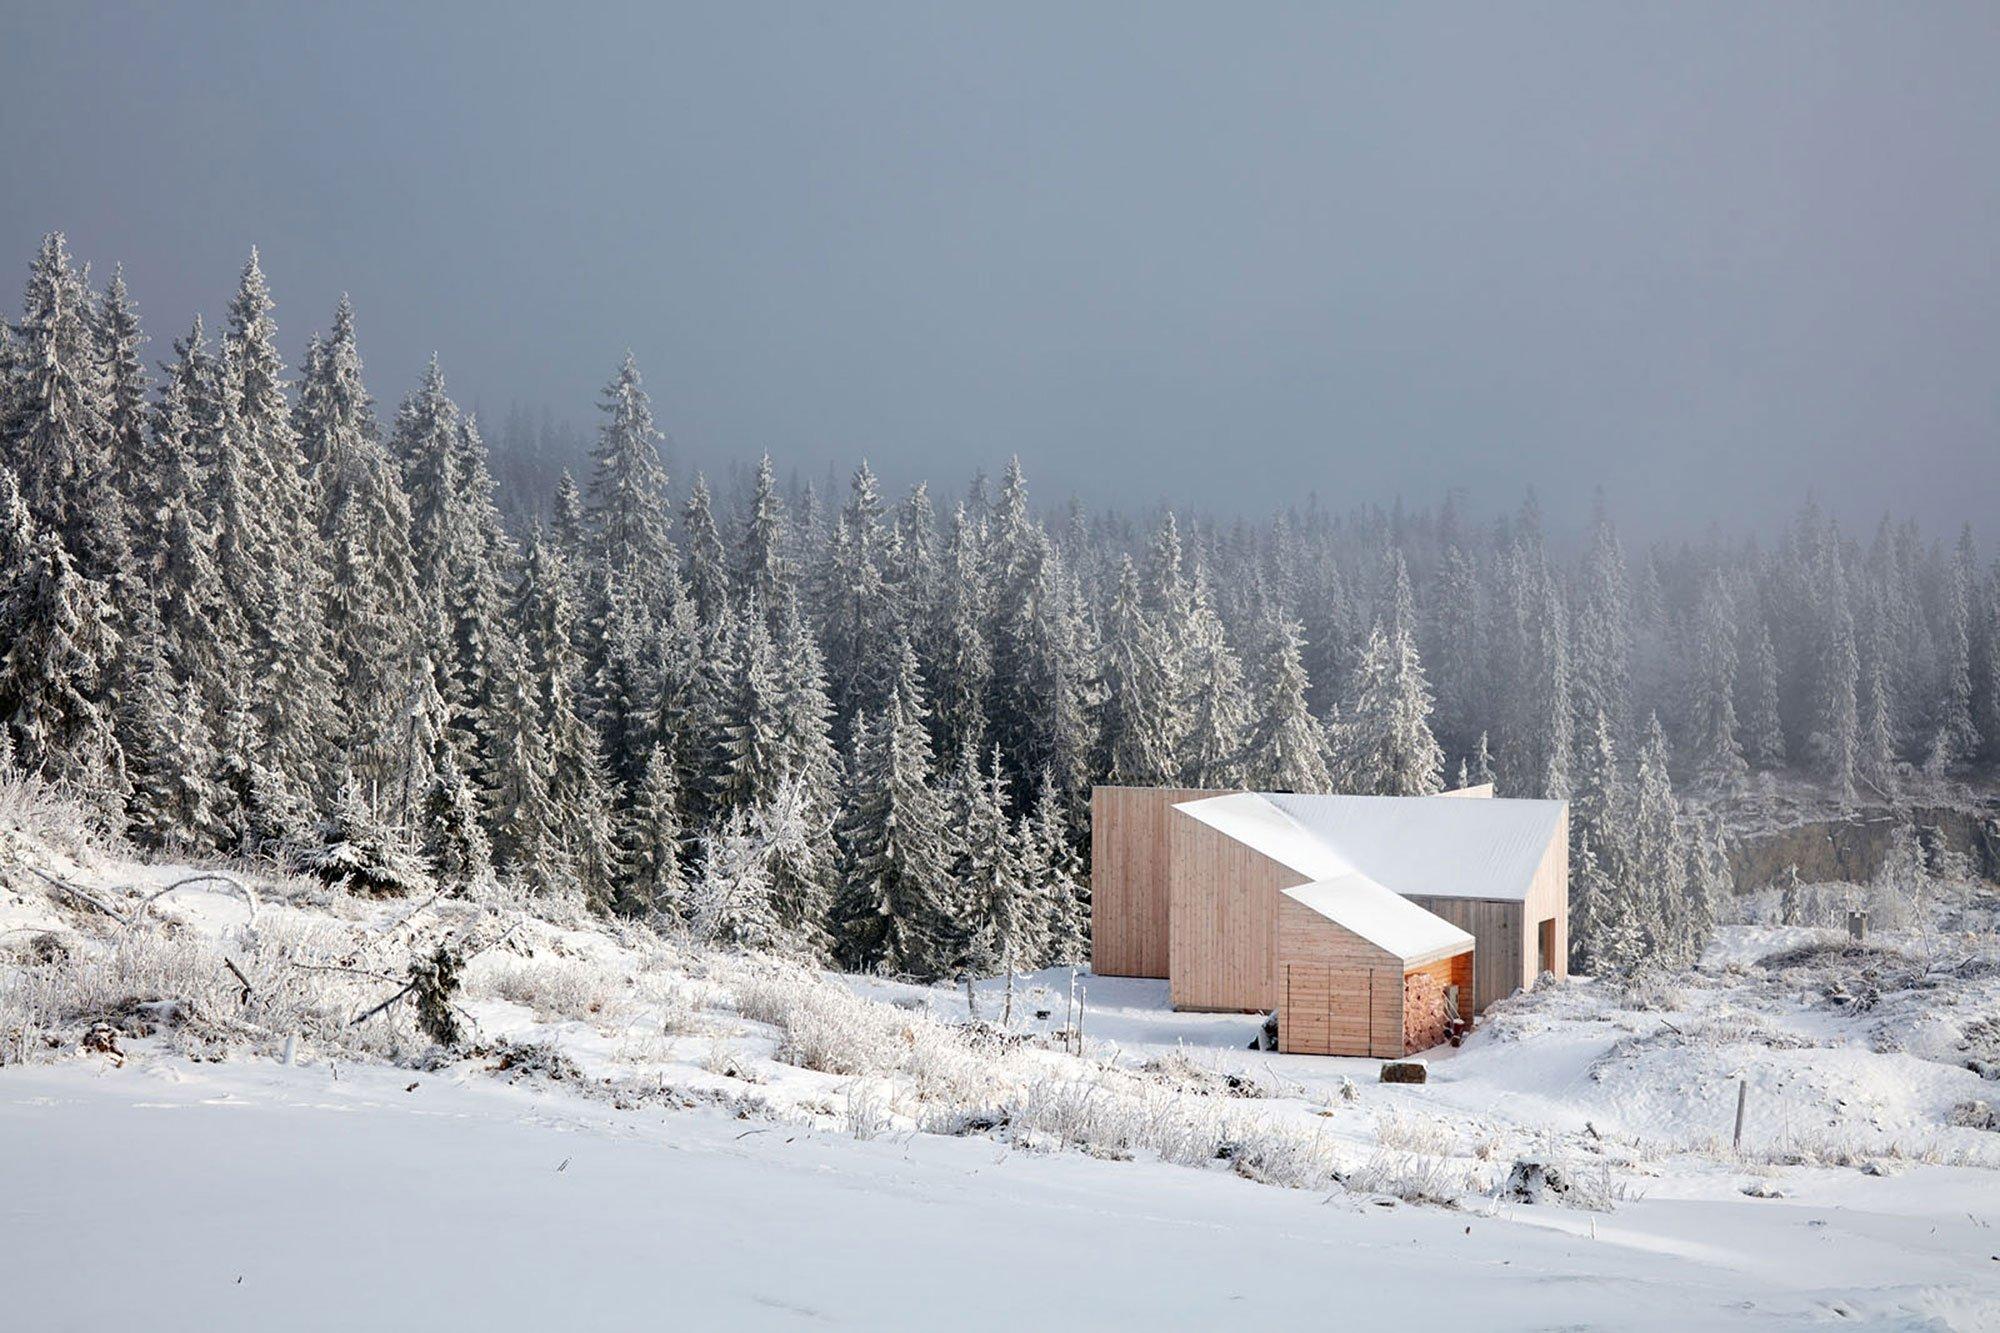 mylla-house-Mork-Ulnes Architects-Bruce-Damonte-05